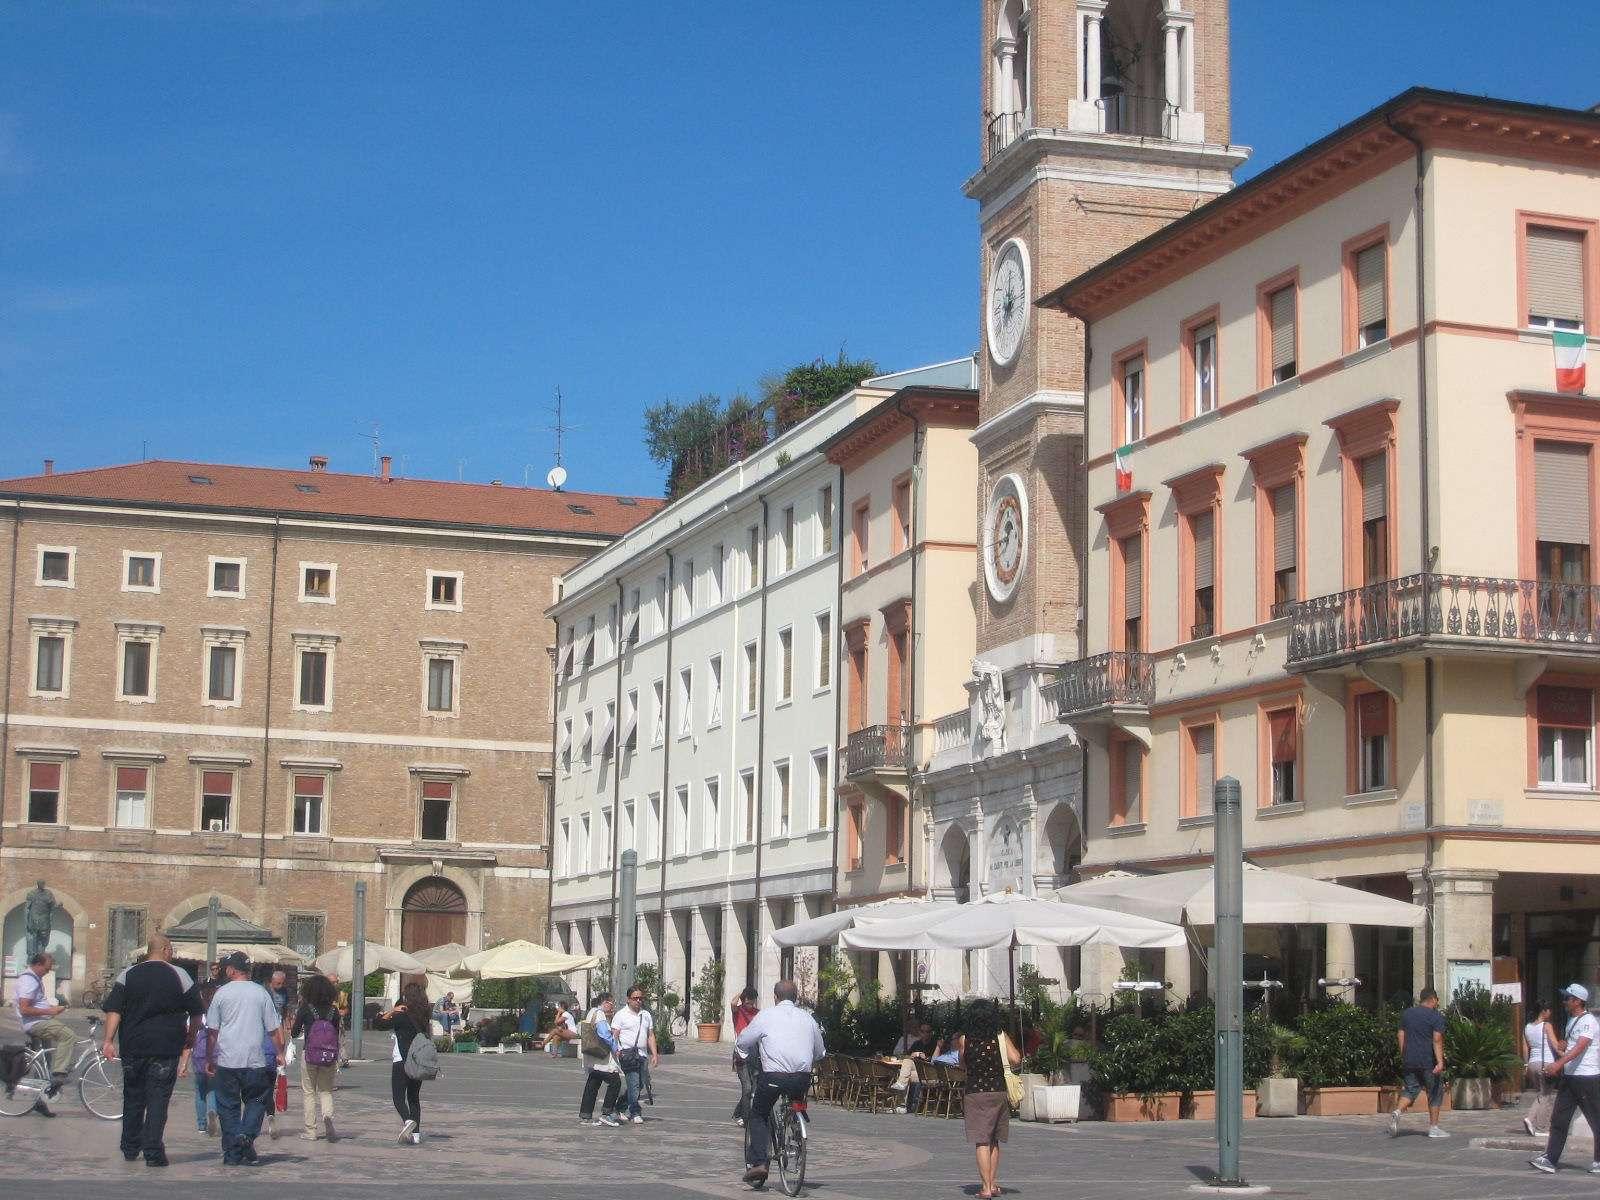 Det trevliga torget Piazza Tre Martiri